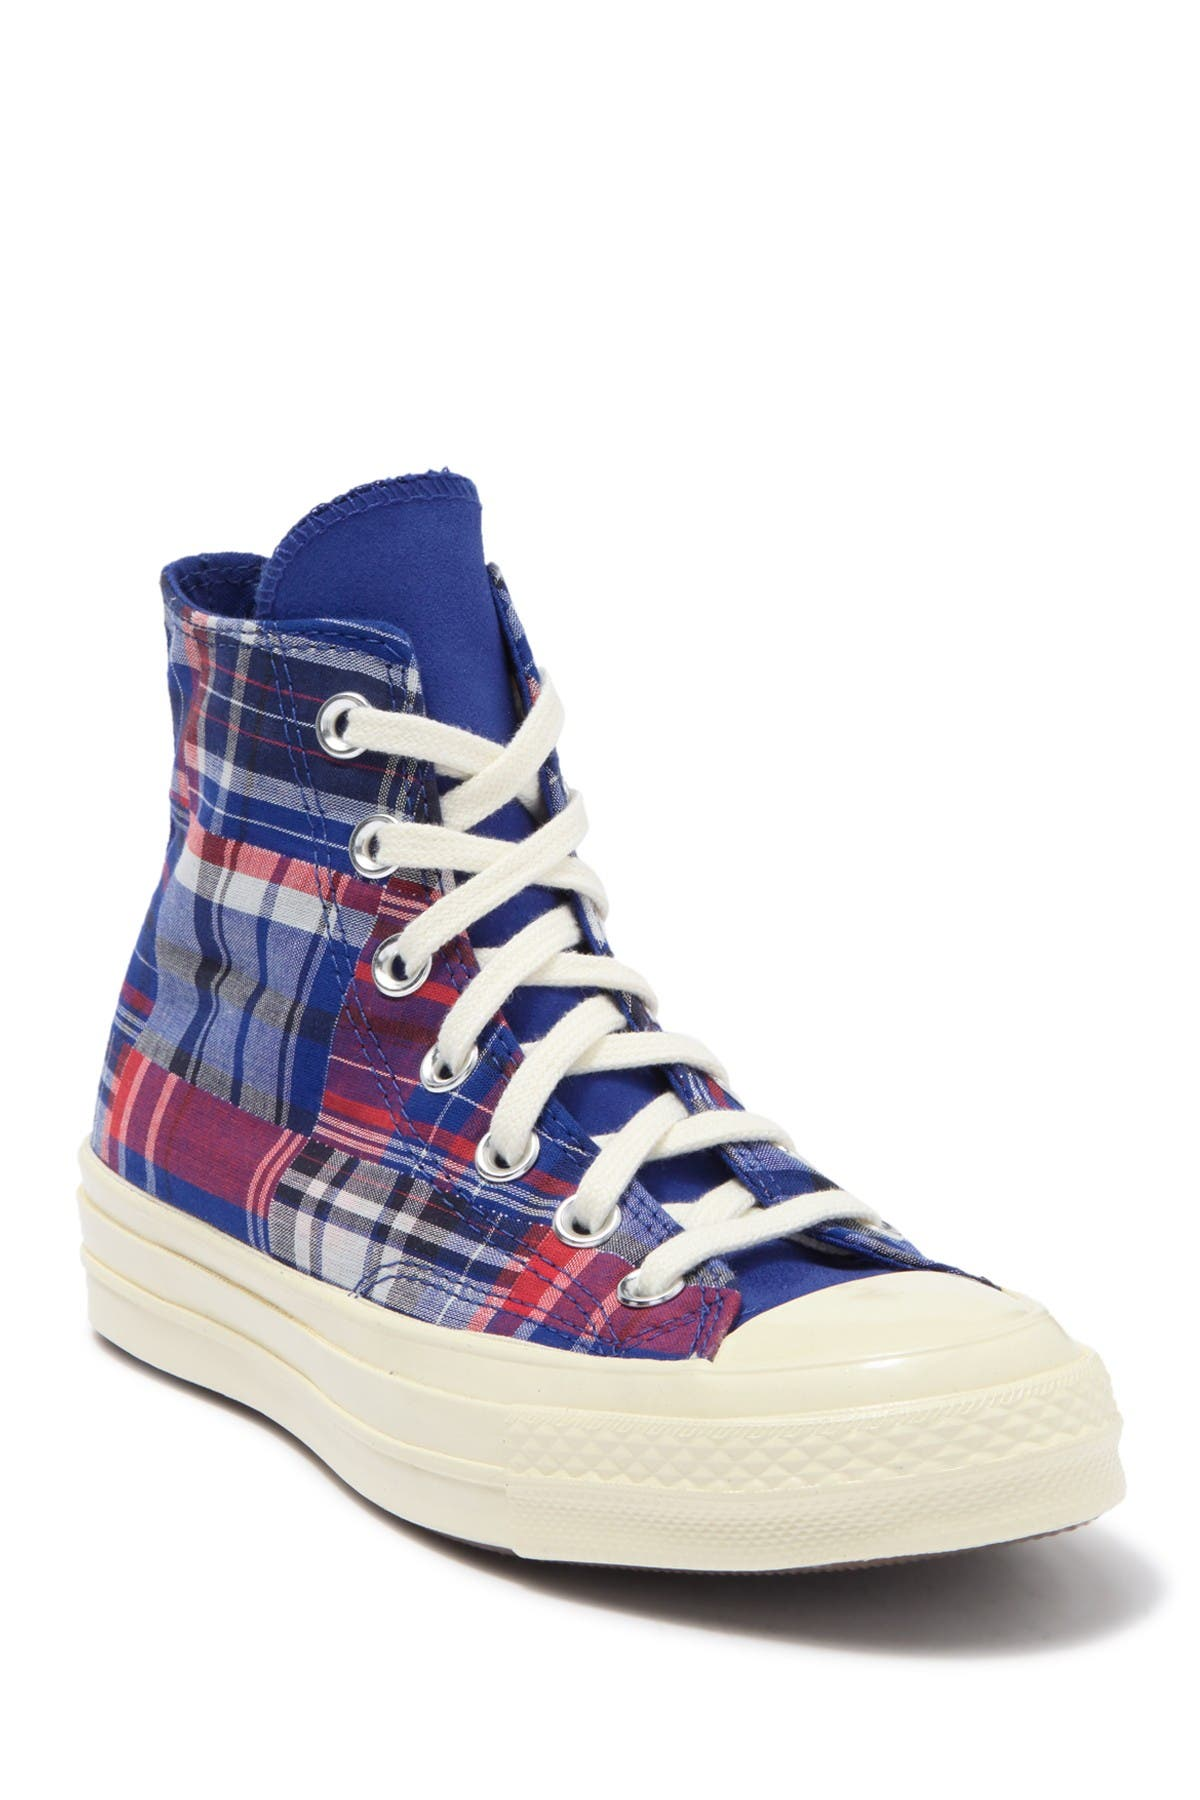 Image of Converse Chuck 70 High Top Rush Plaid Sneaker